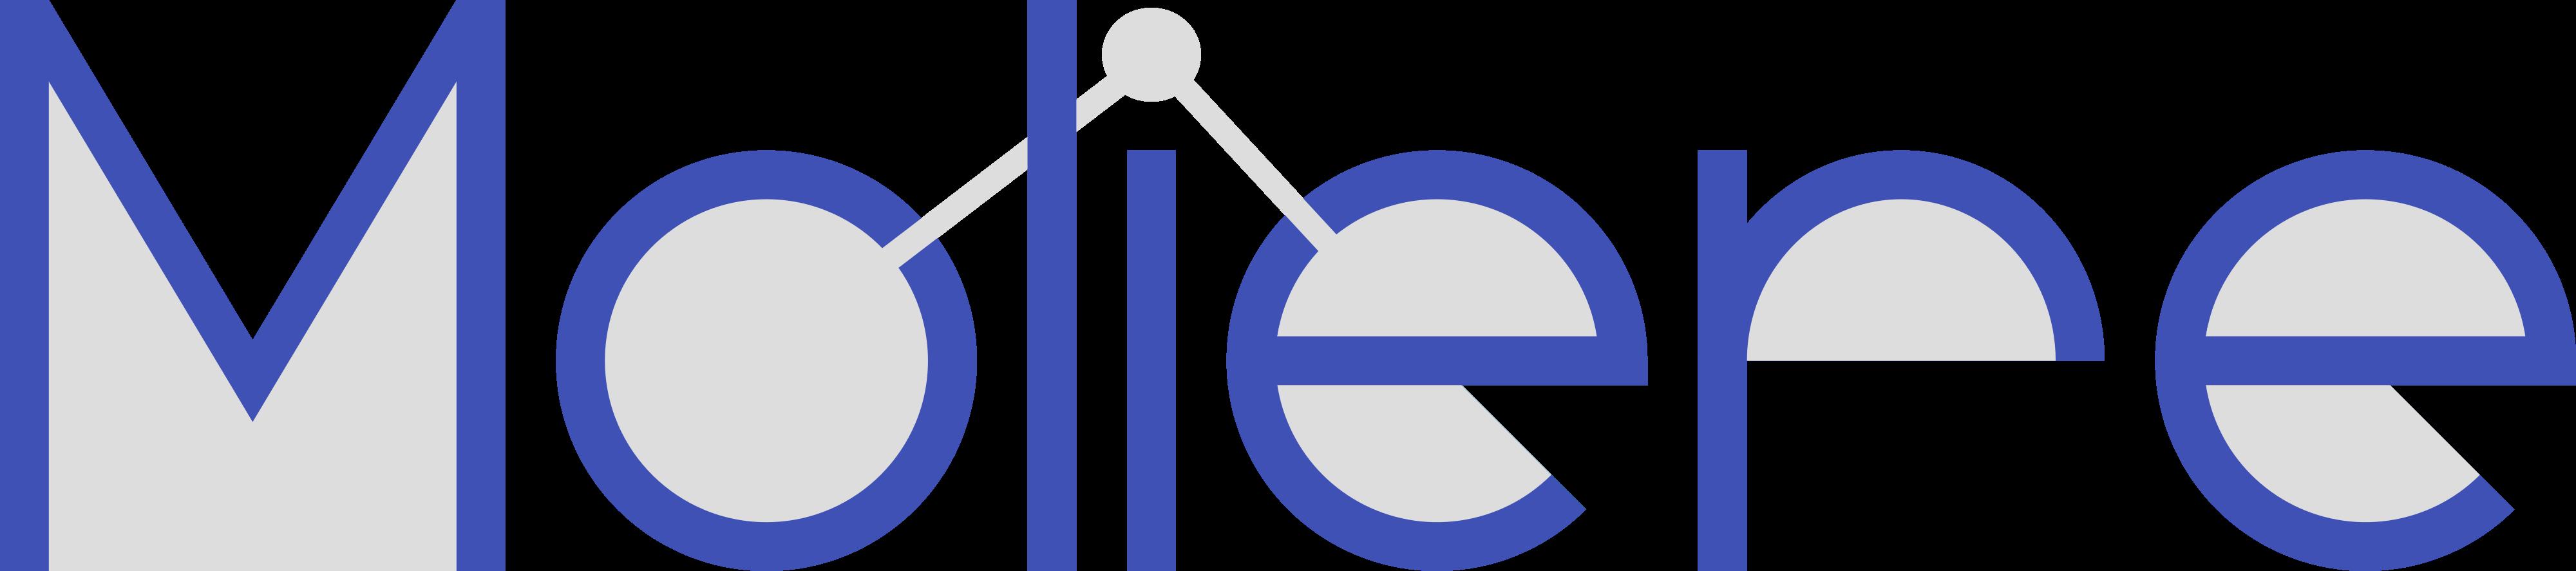 moliere_logo